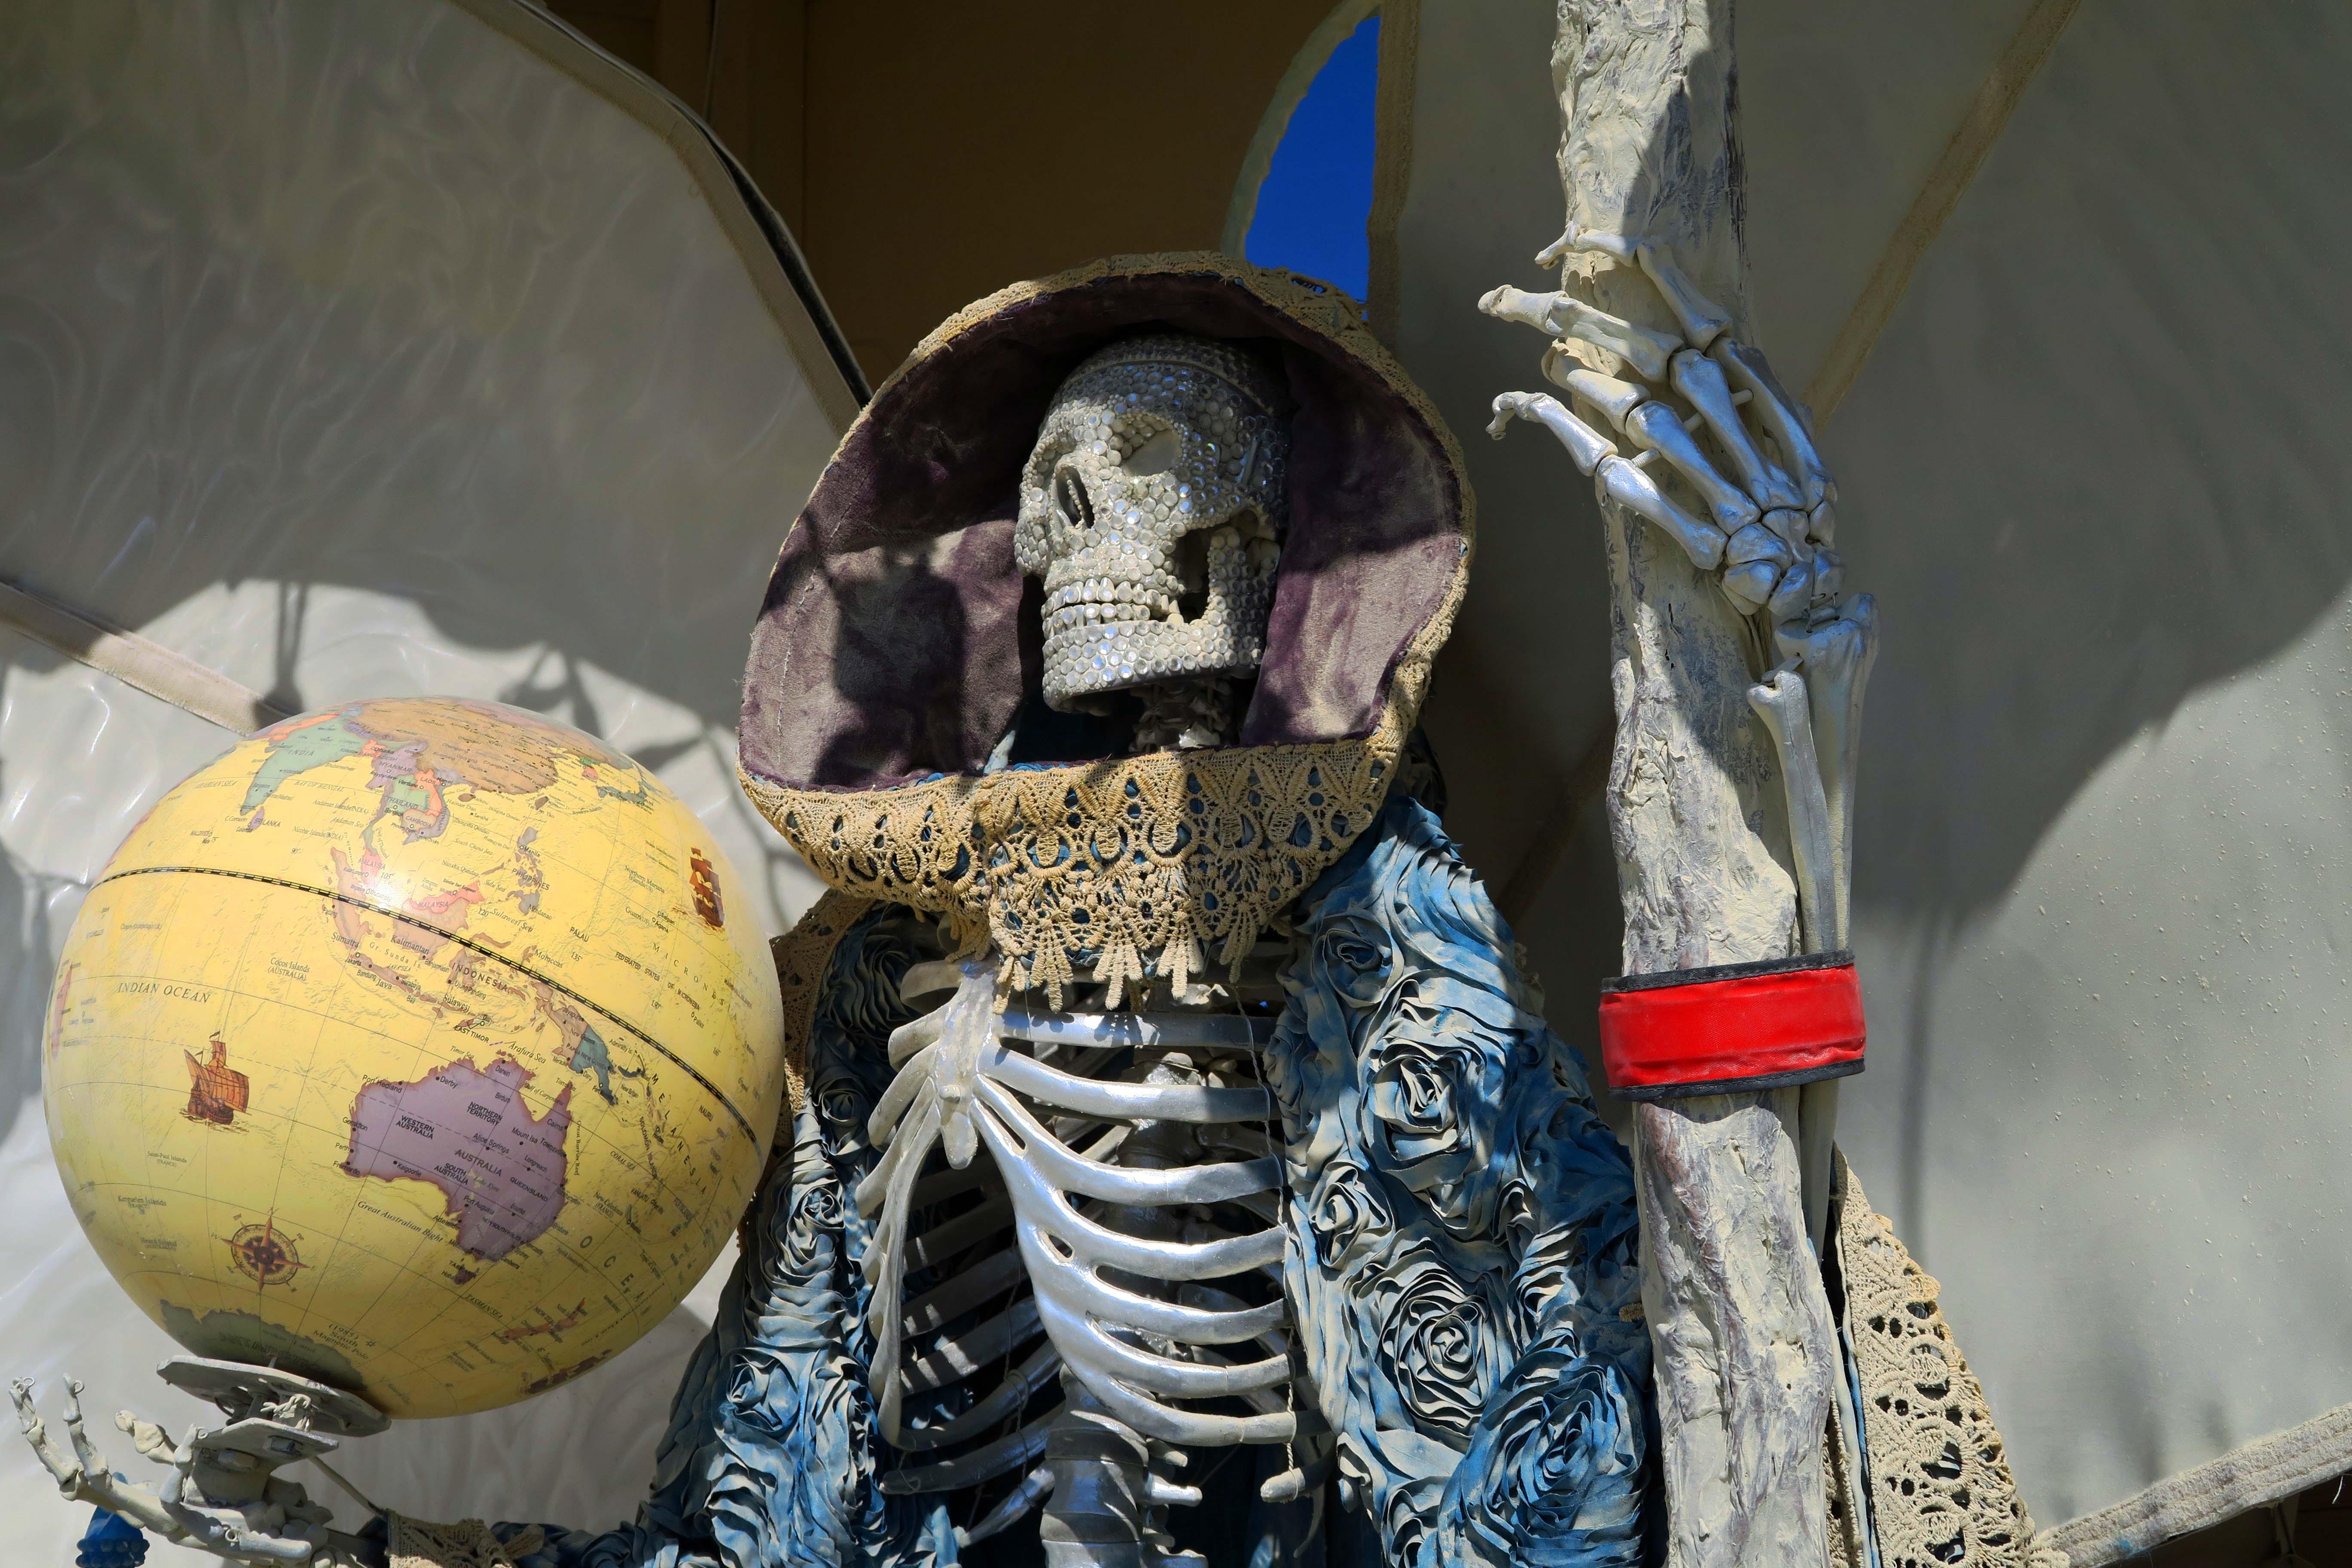 La Santisima Muerte close up at Burning Man 2017